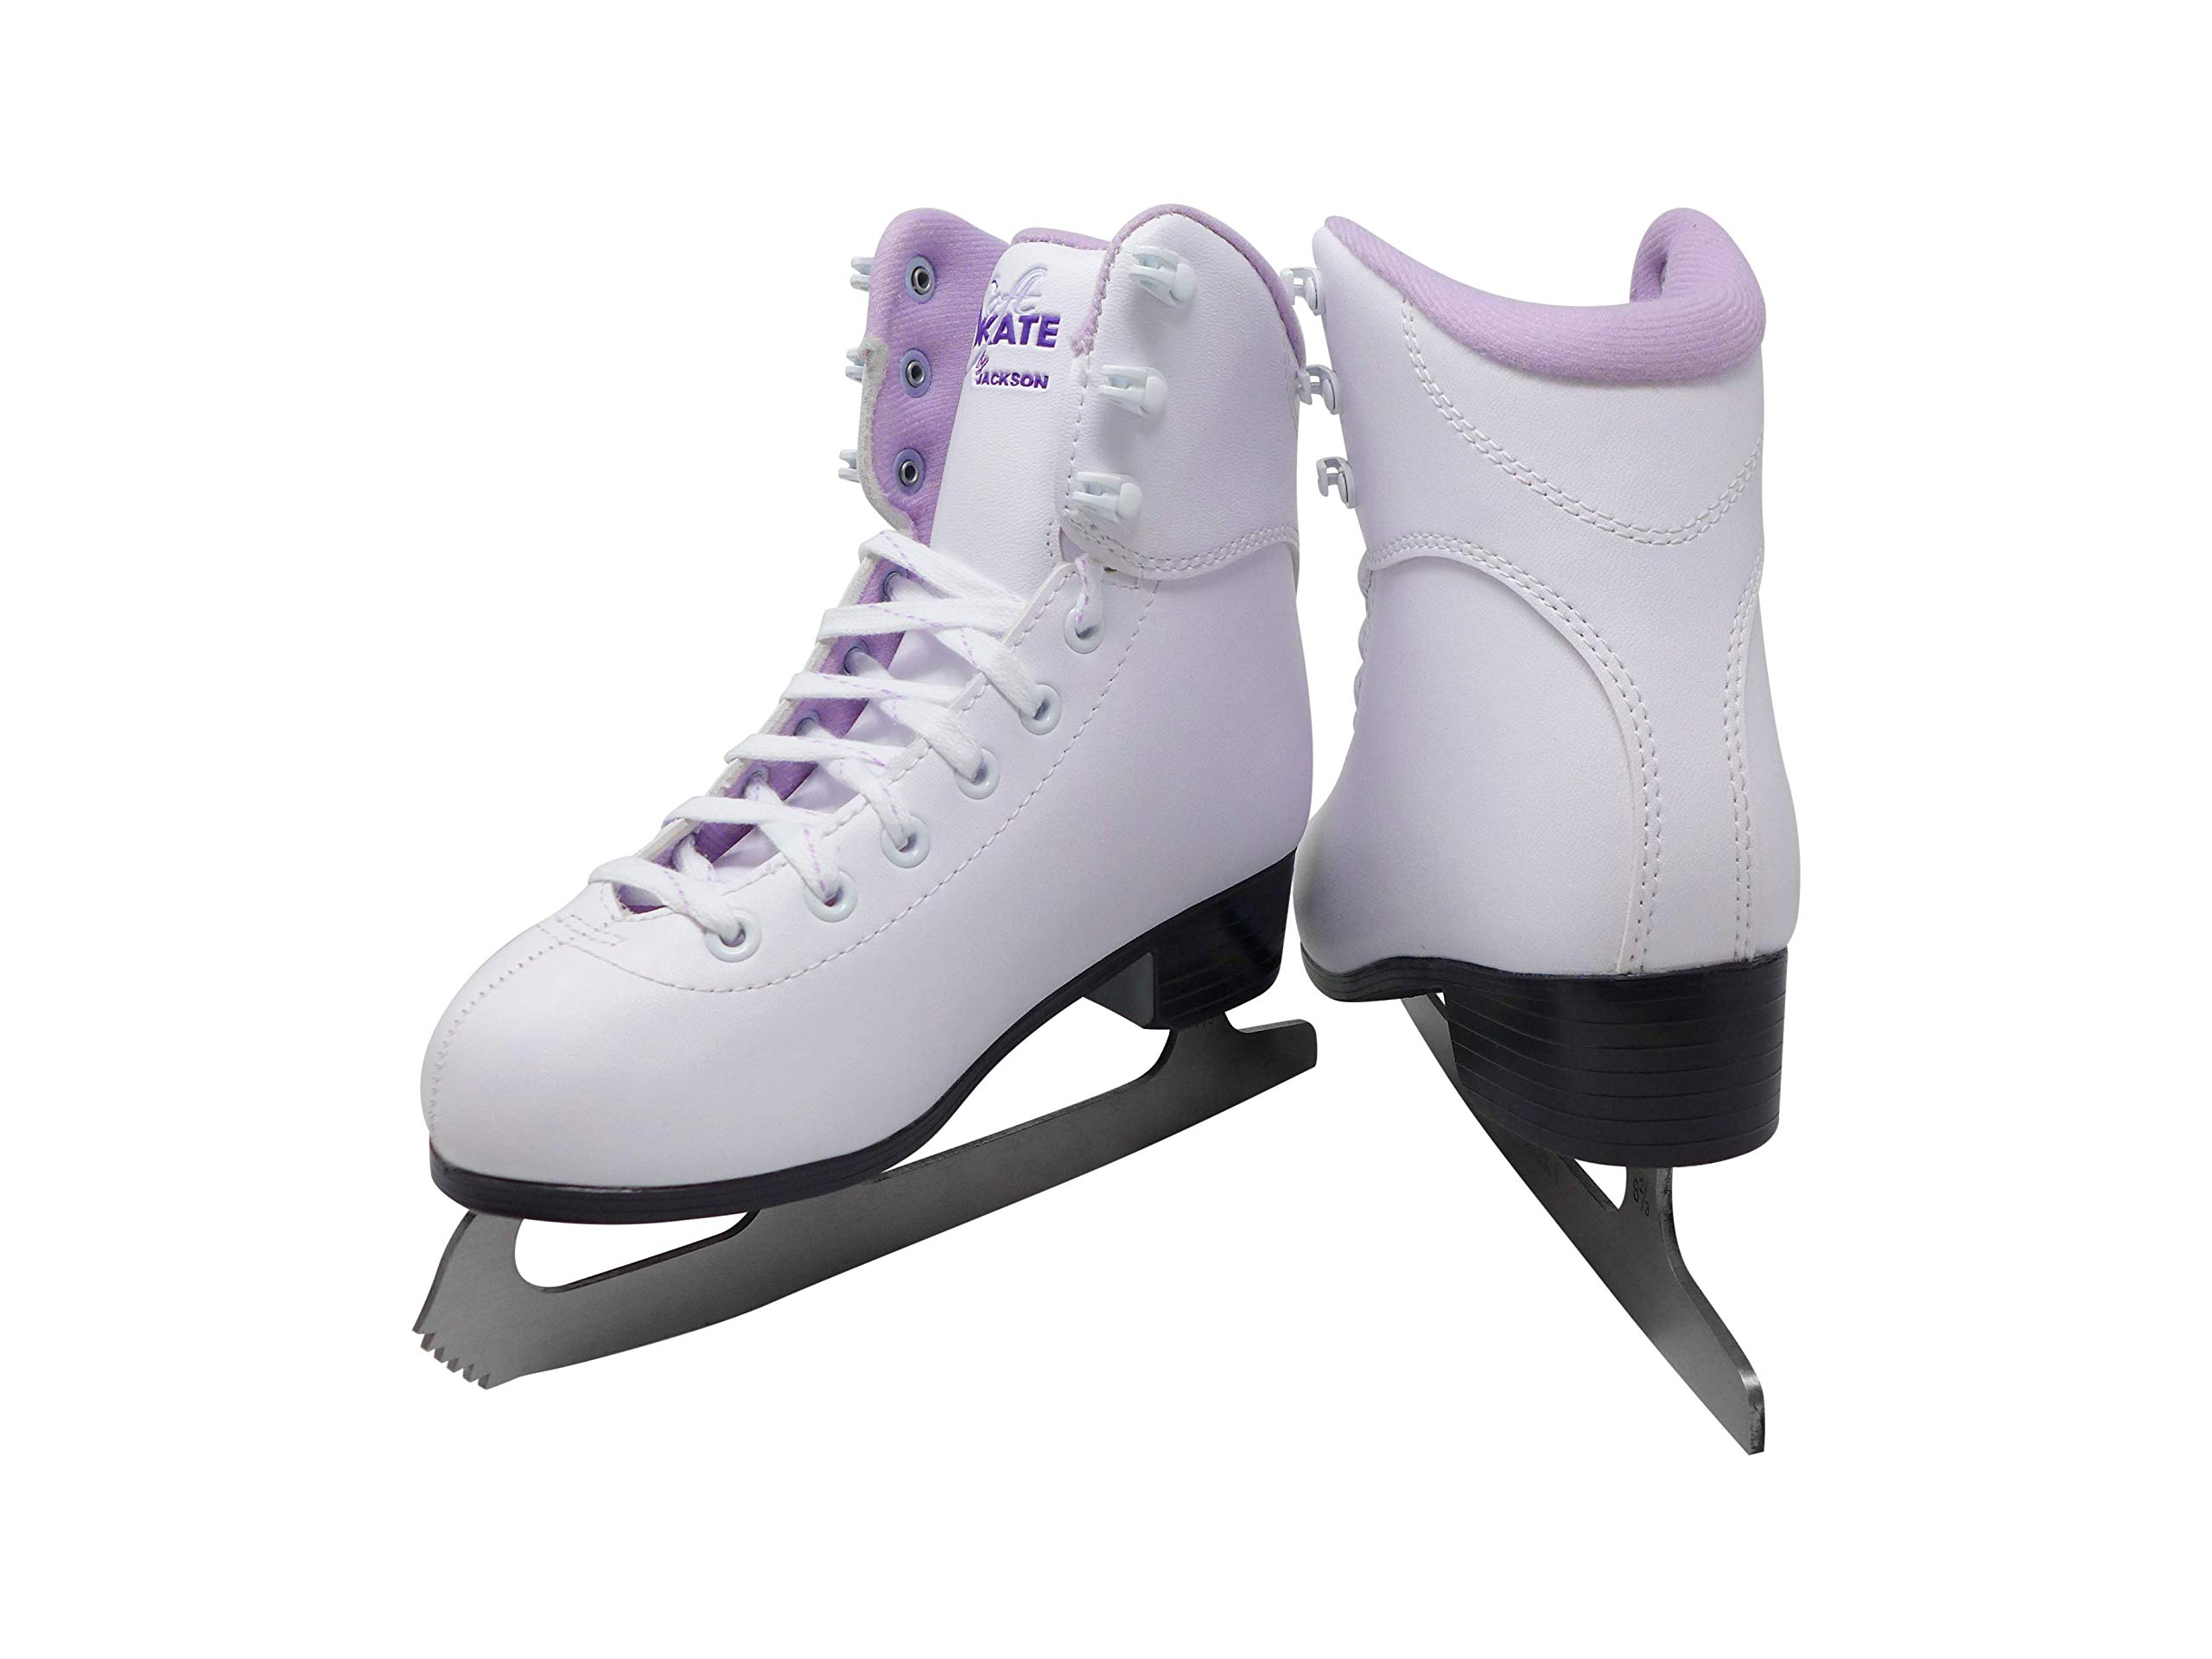 Jackson Ultima GS180 SoftSkate Womens Ice Skates / Blue